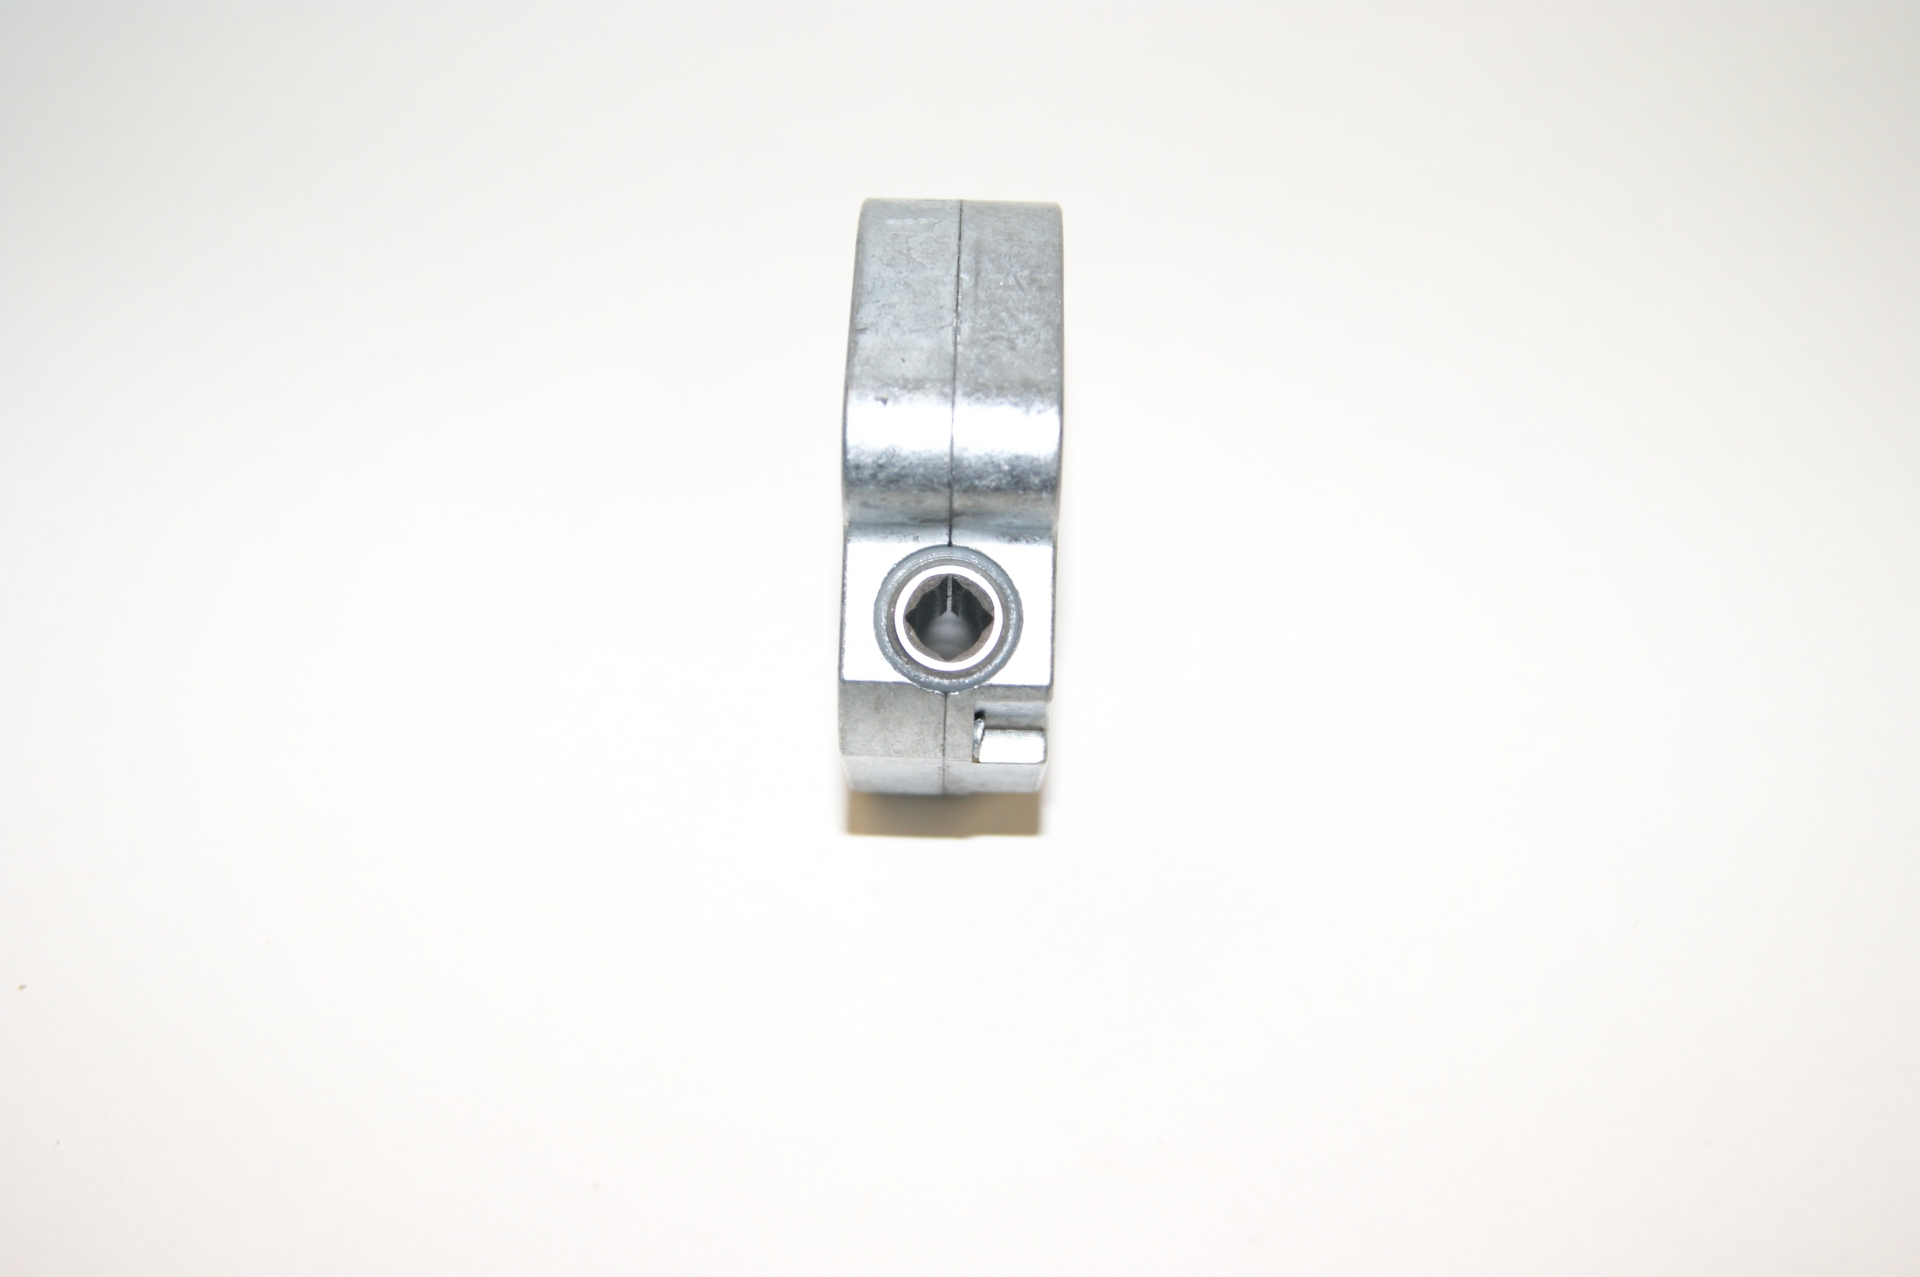 treuil rv 4 1 carre de 7 mm pour novacolor reference 531010 0000 elect fermetures. Black Bedroom Furniture Sets. Home Design Ideas